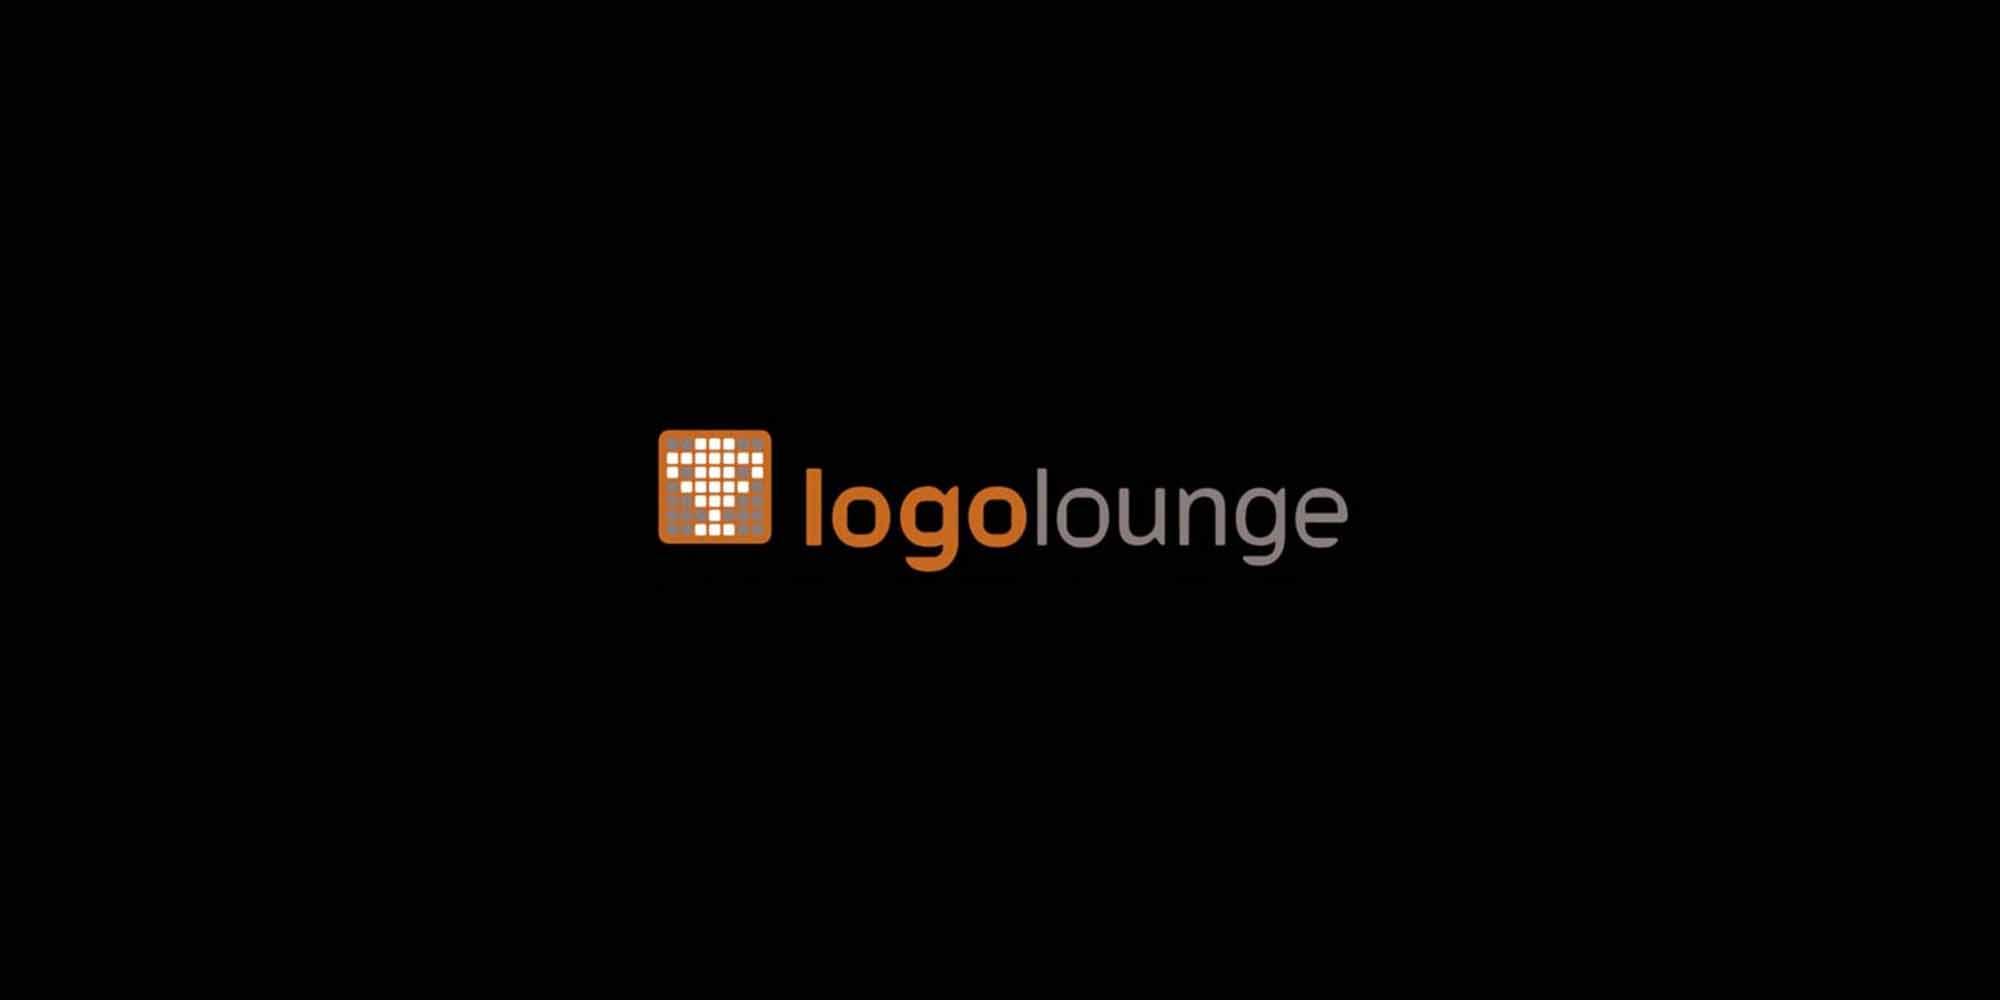 Logolounge Logo